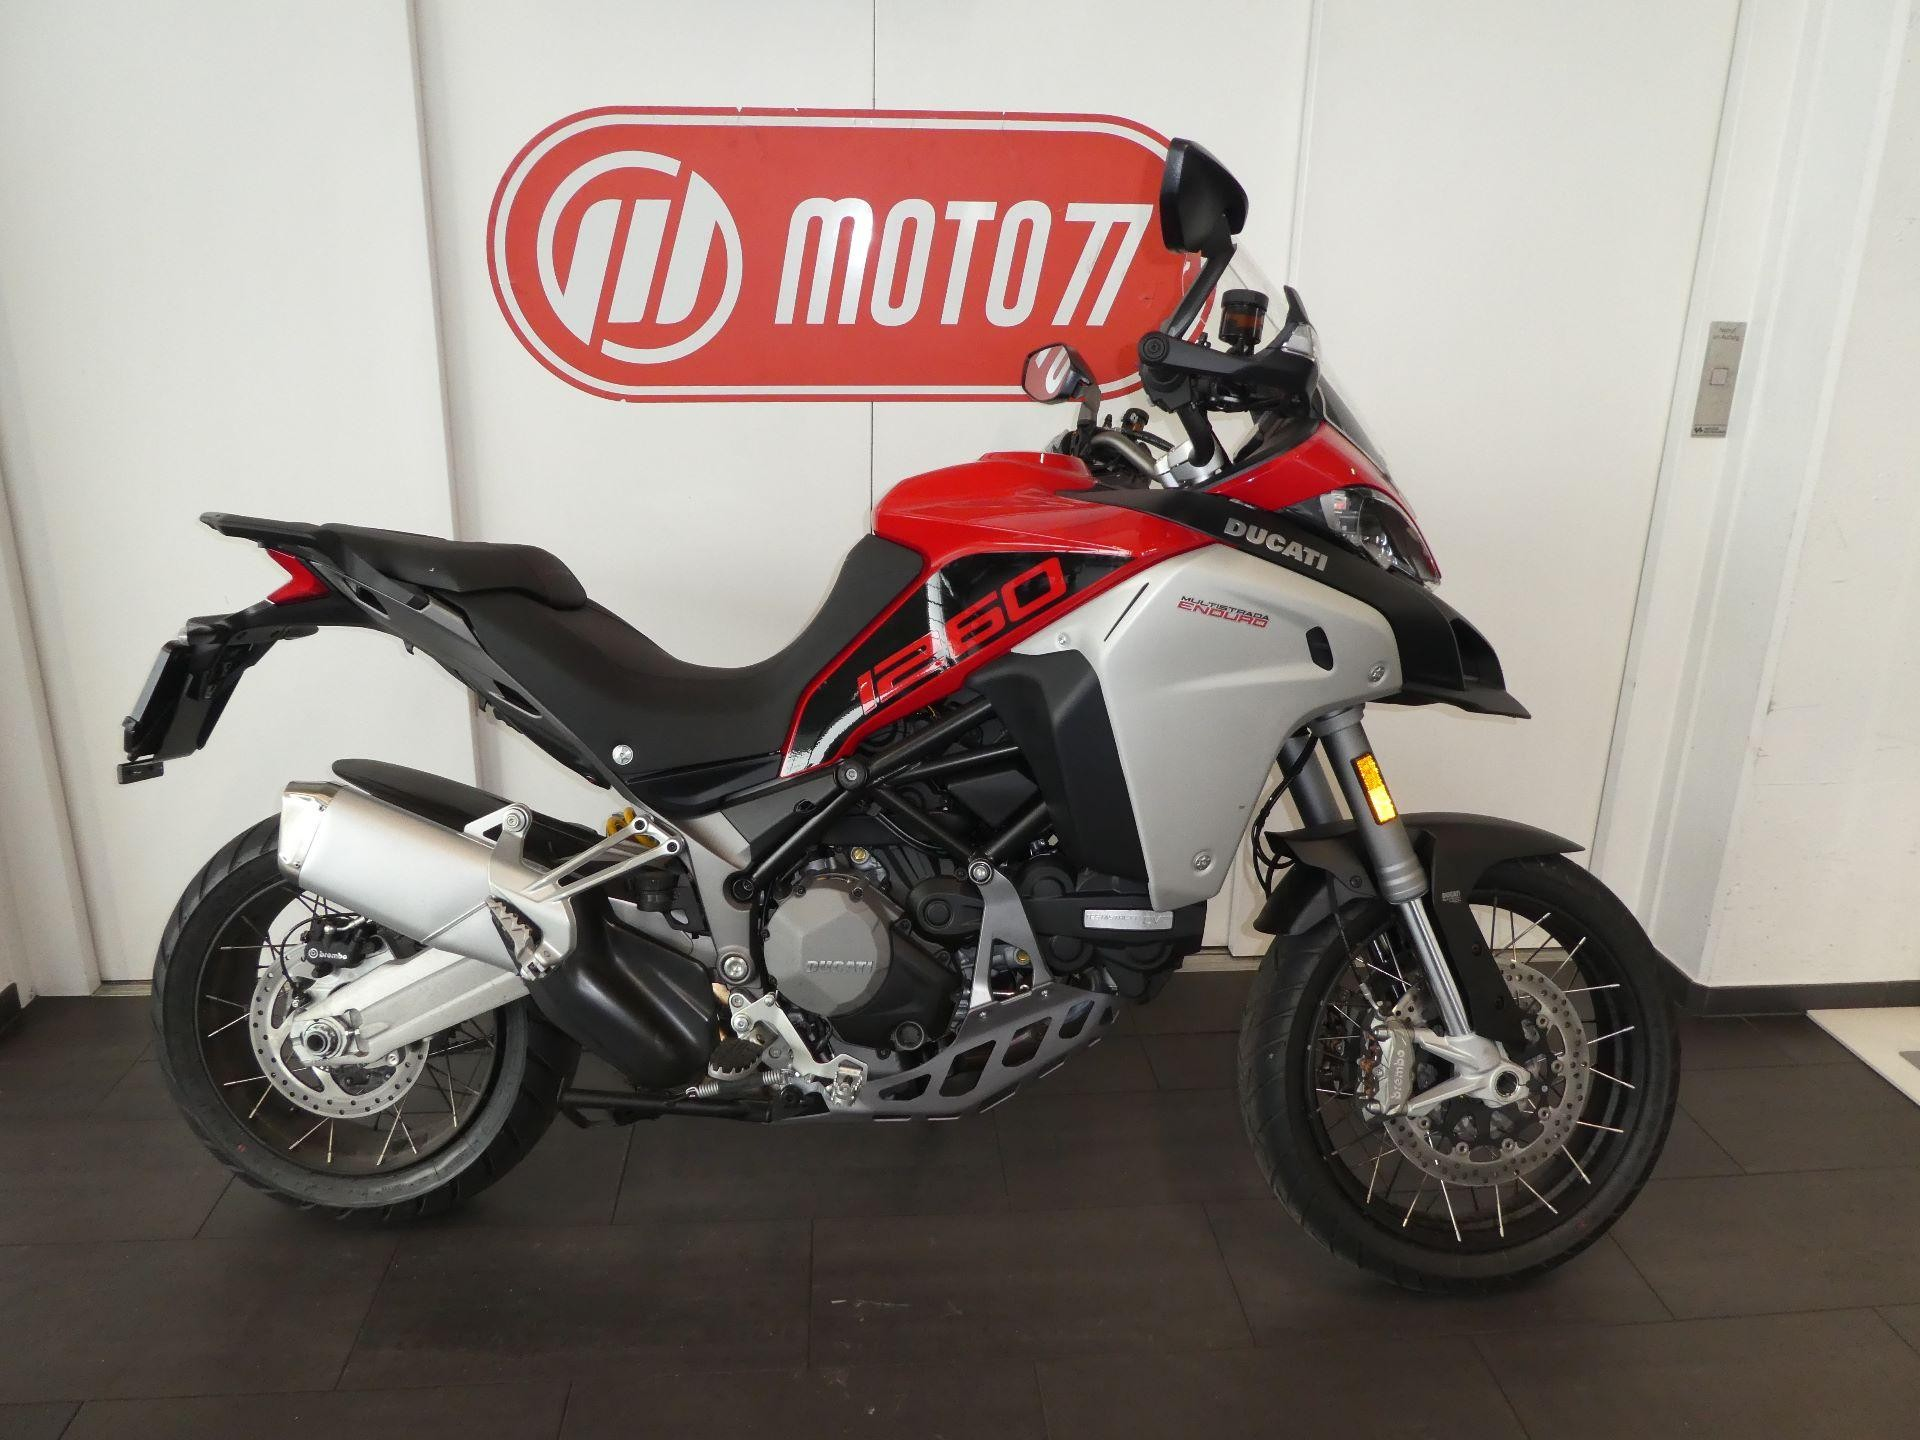 Motorrad Mieten & Roller Mieten DUCATI 1260 Multistrada Enduro